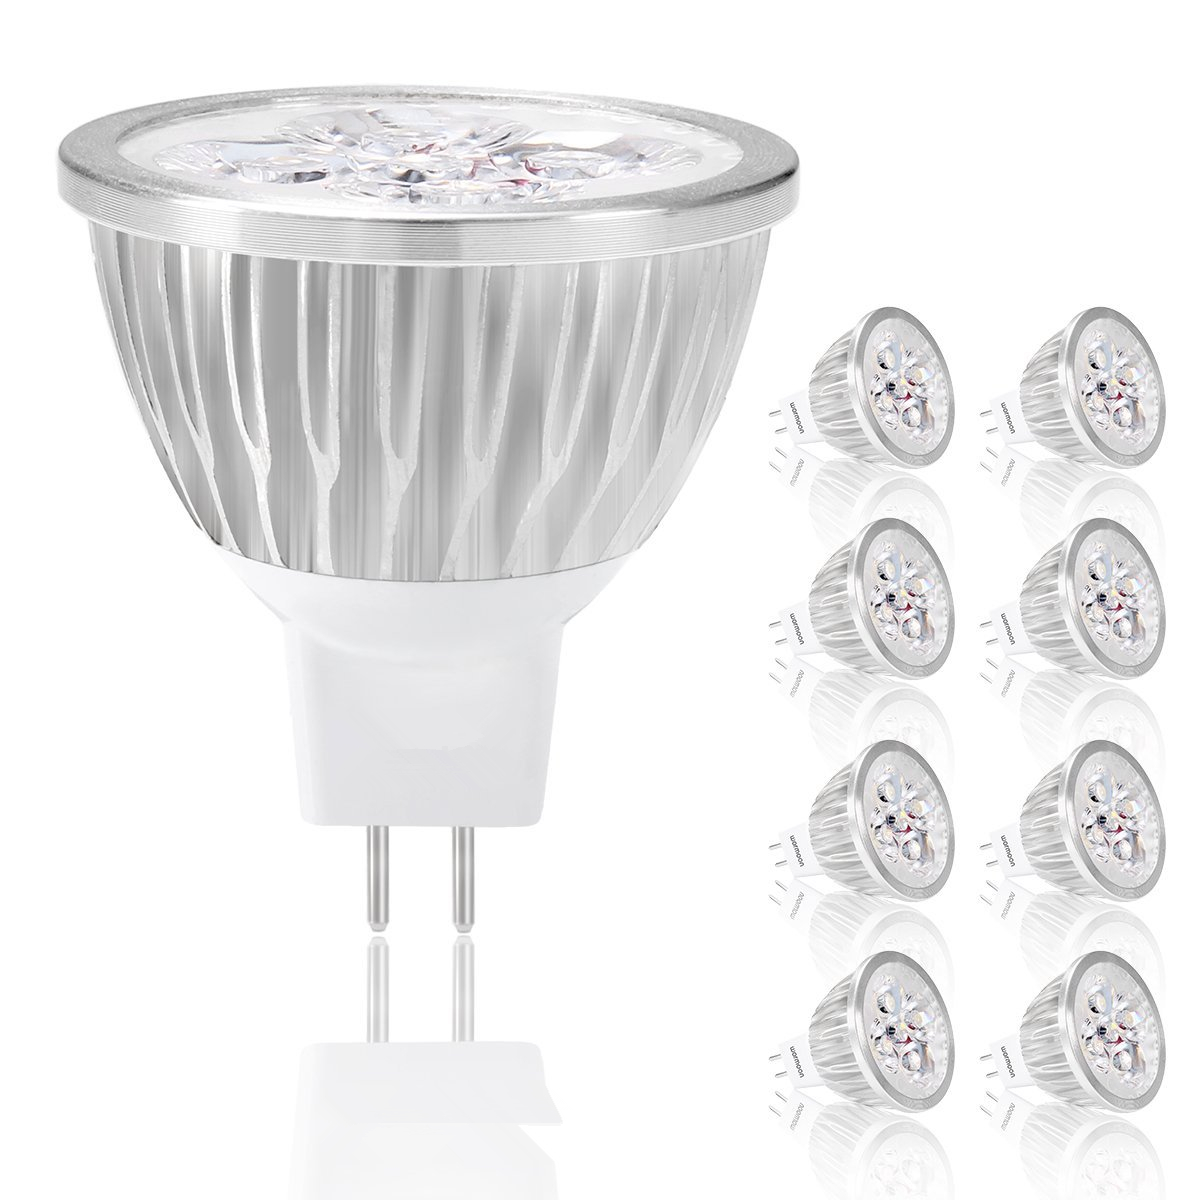 Wholesale LED BULB mr16 Super Brightness 5W 4W 3W 12V MR16 LED Spotlight Warm Cool White New Style LED Light LED Bulb